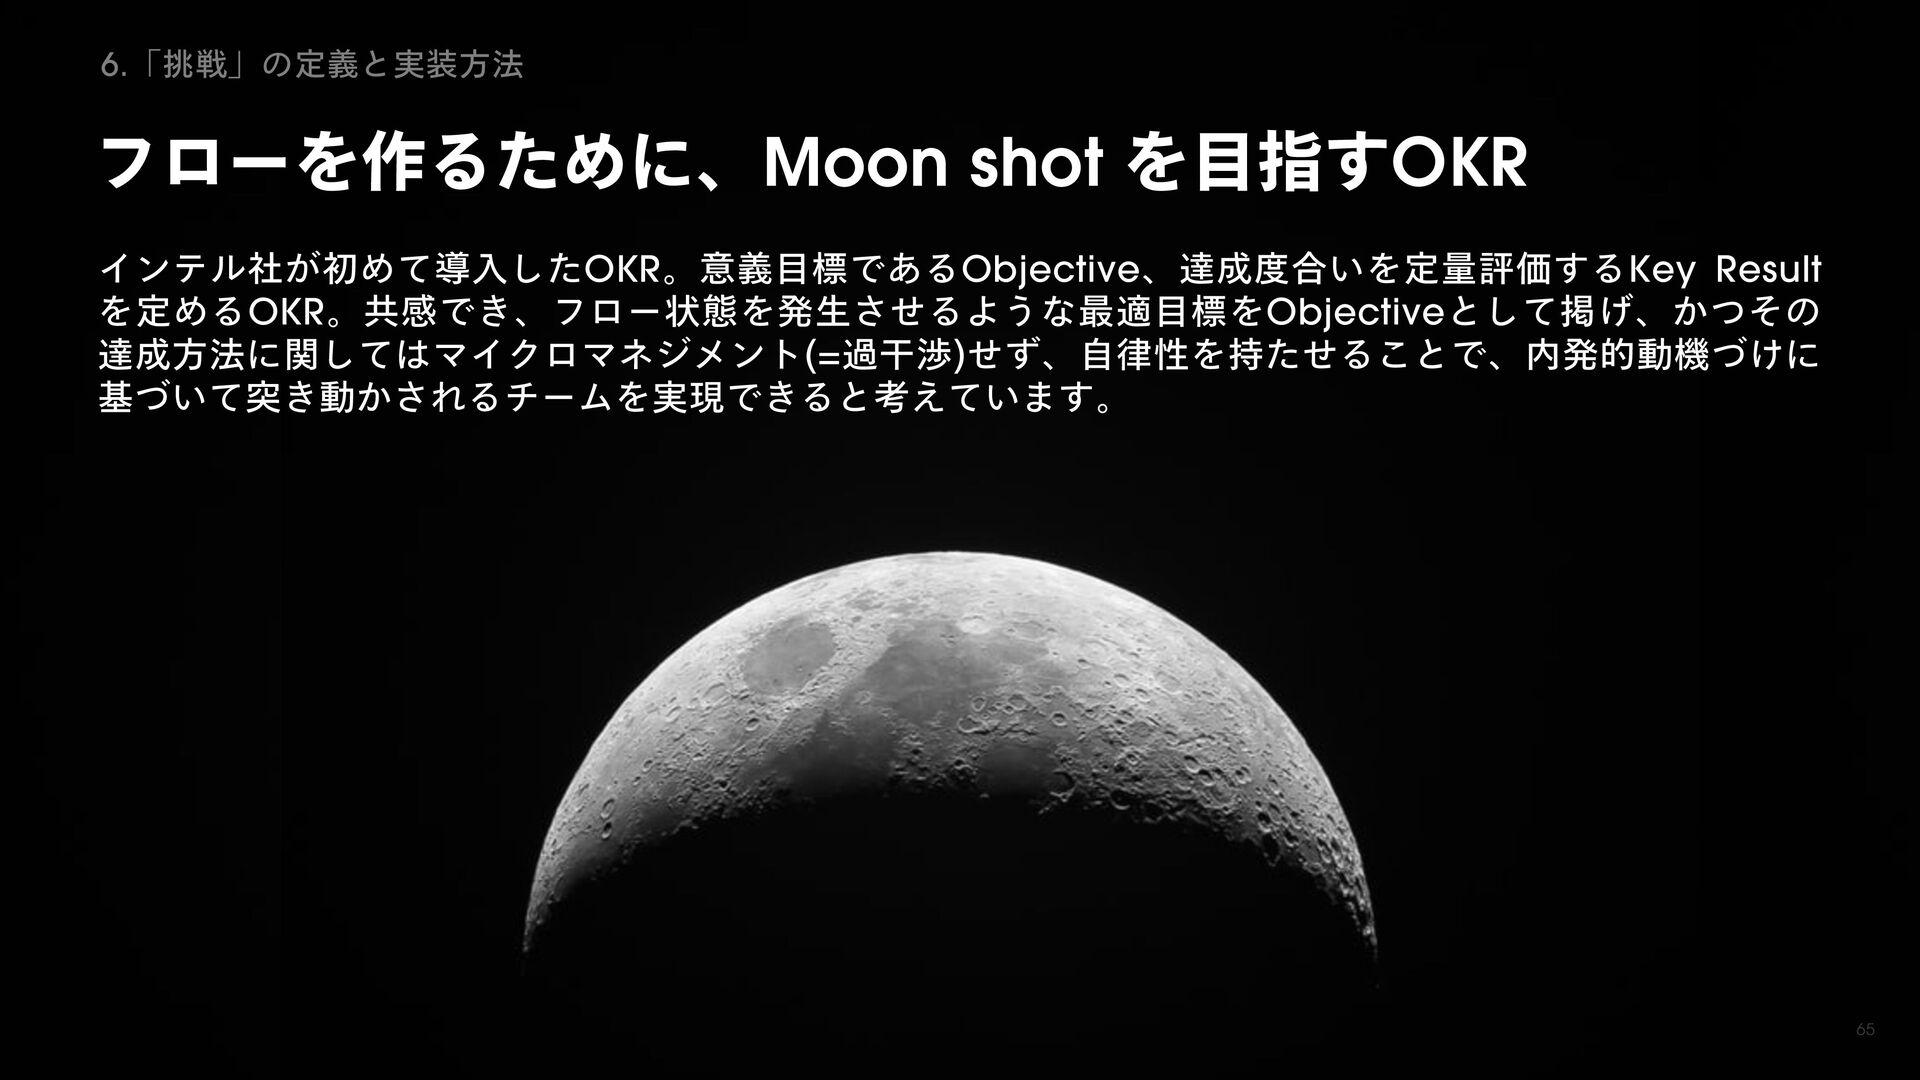 ϑϩʔΛ࡞ΔͨΊʹɺMoon shot Λࢦ͢OKR Πϯςϧ͕ࣾॳΊͯಋೖͨ͠OKRɻҙٛ...